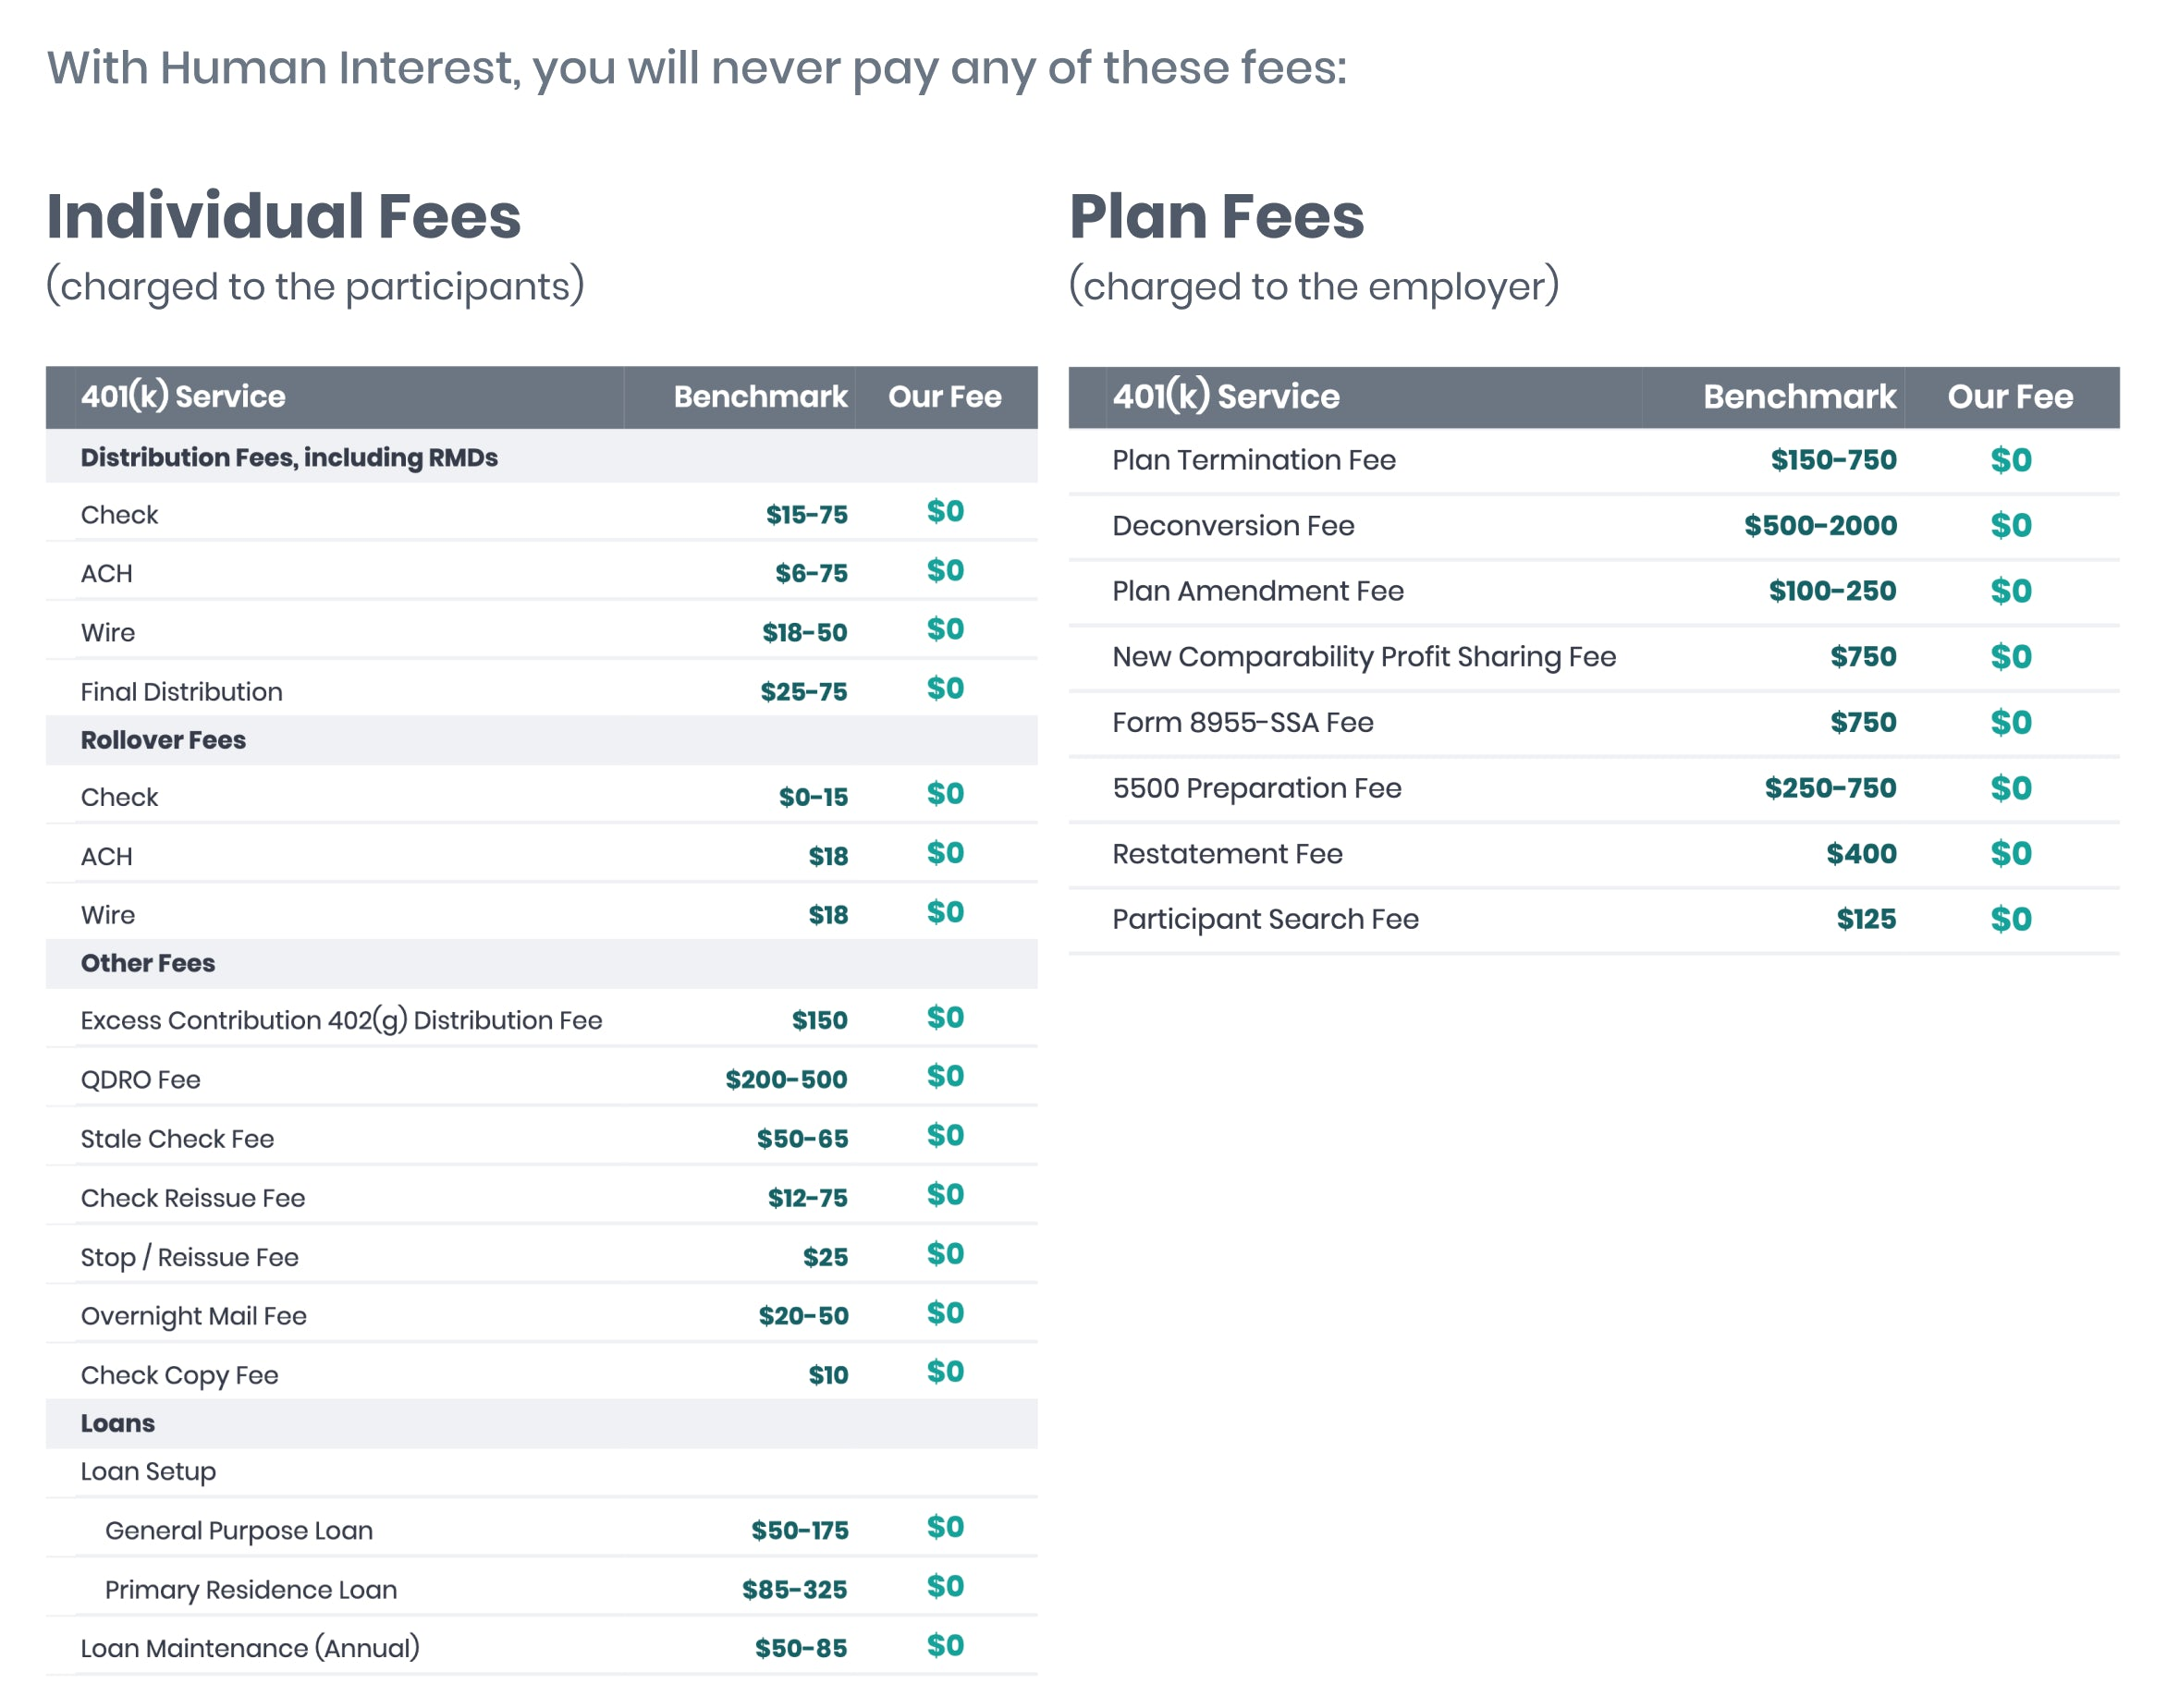 Table showing zero 401(k) transaction fees